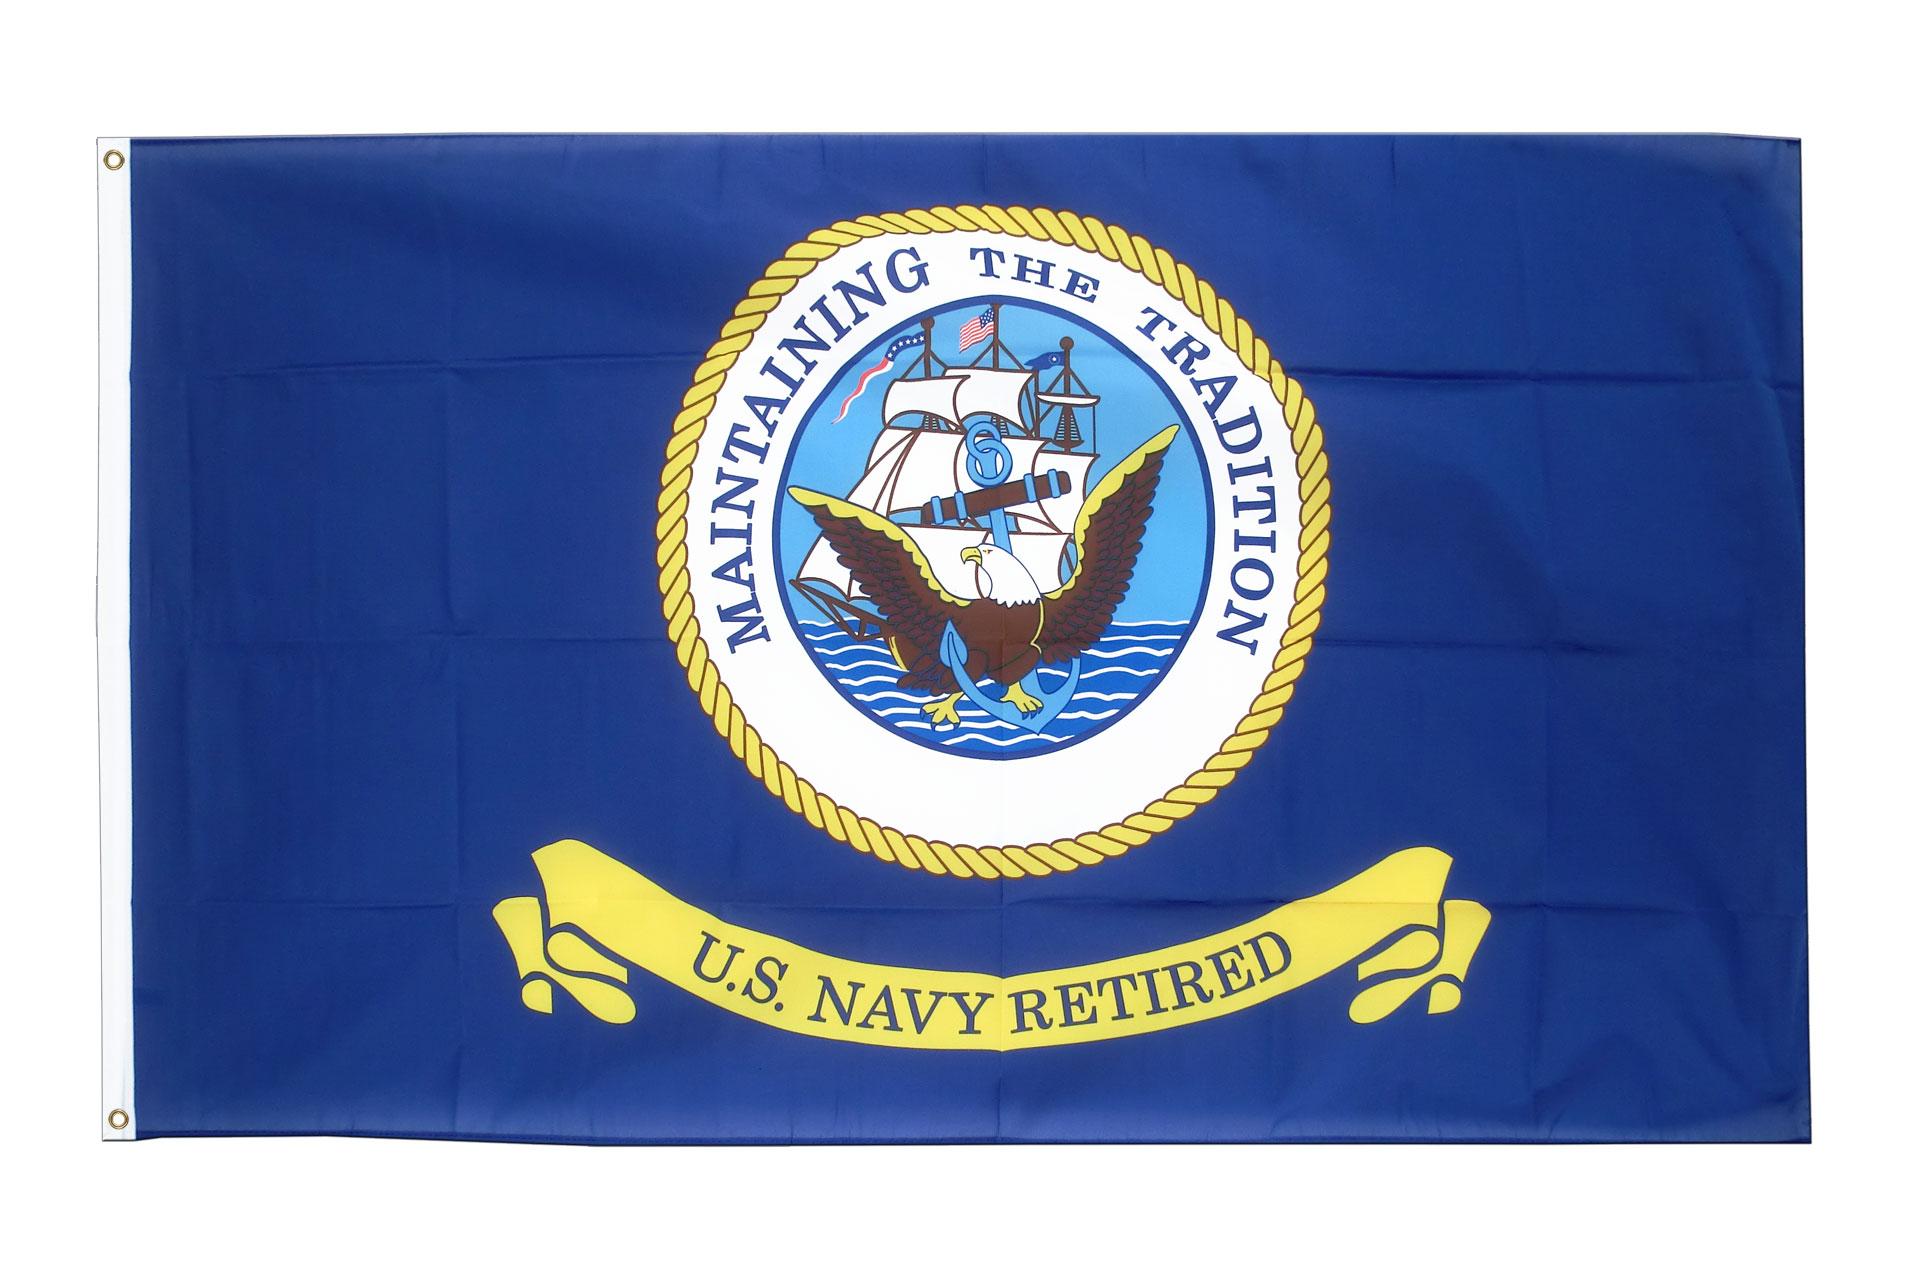 Buy us navy retired flag 3x5 ft 90x150 cm royal flags